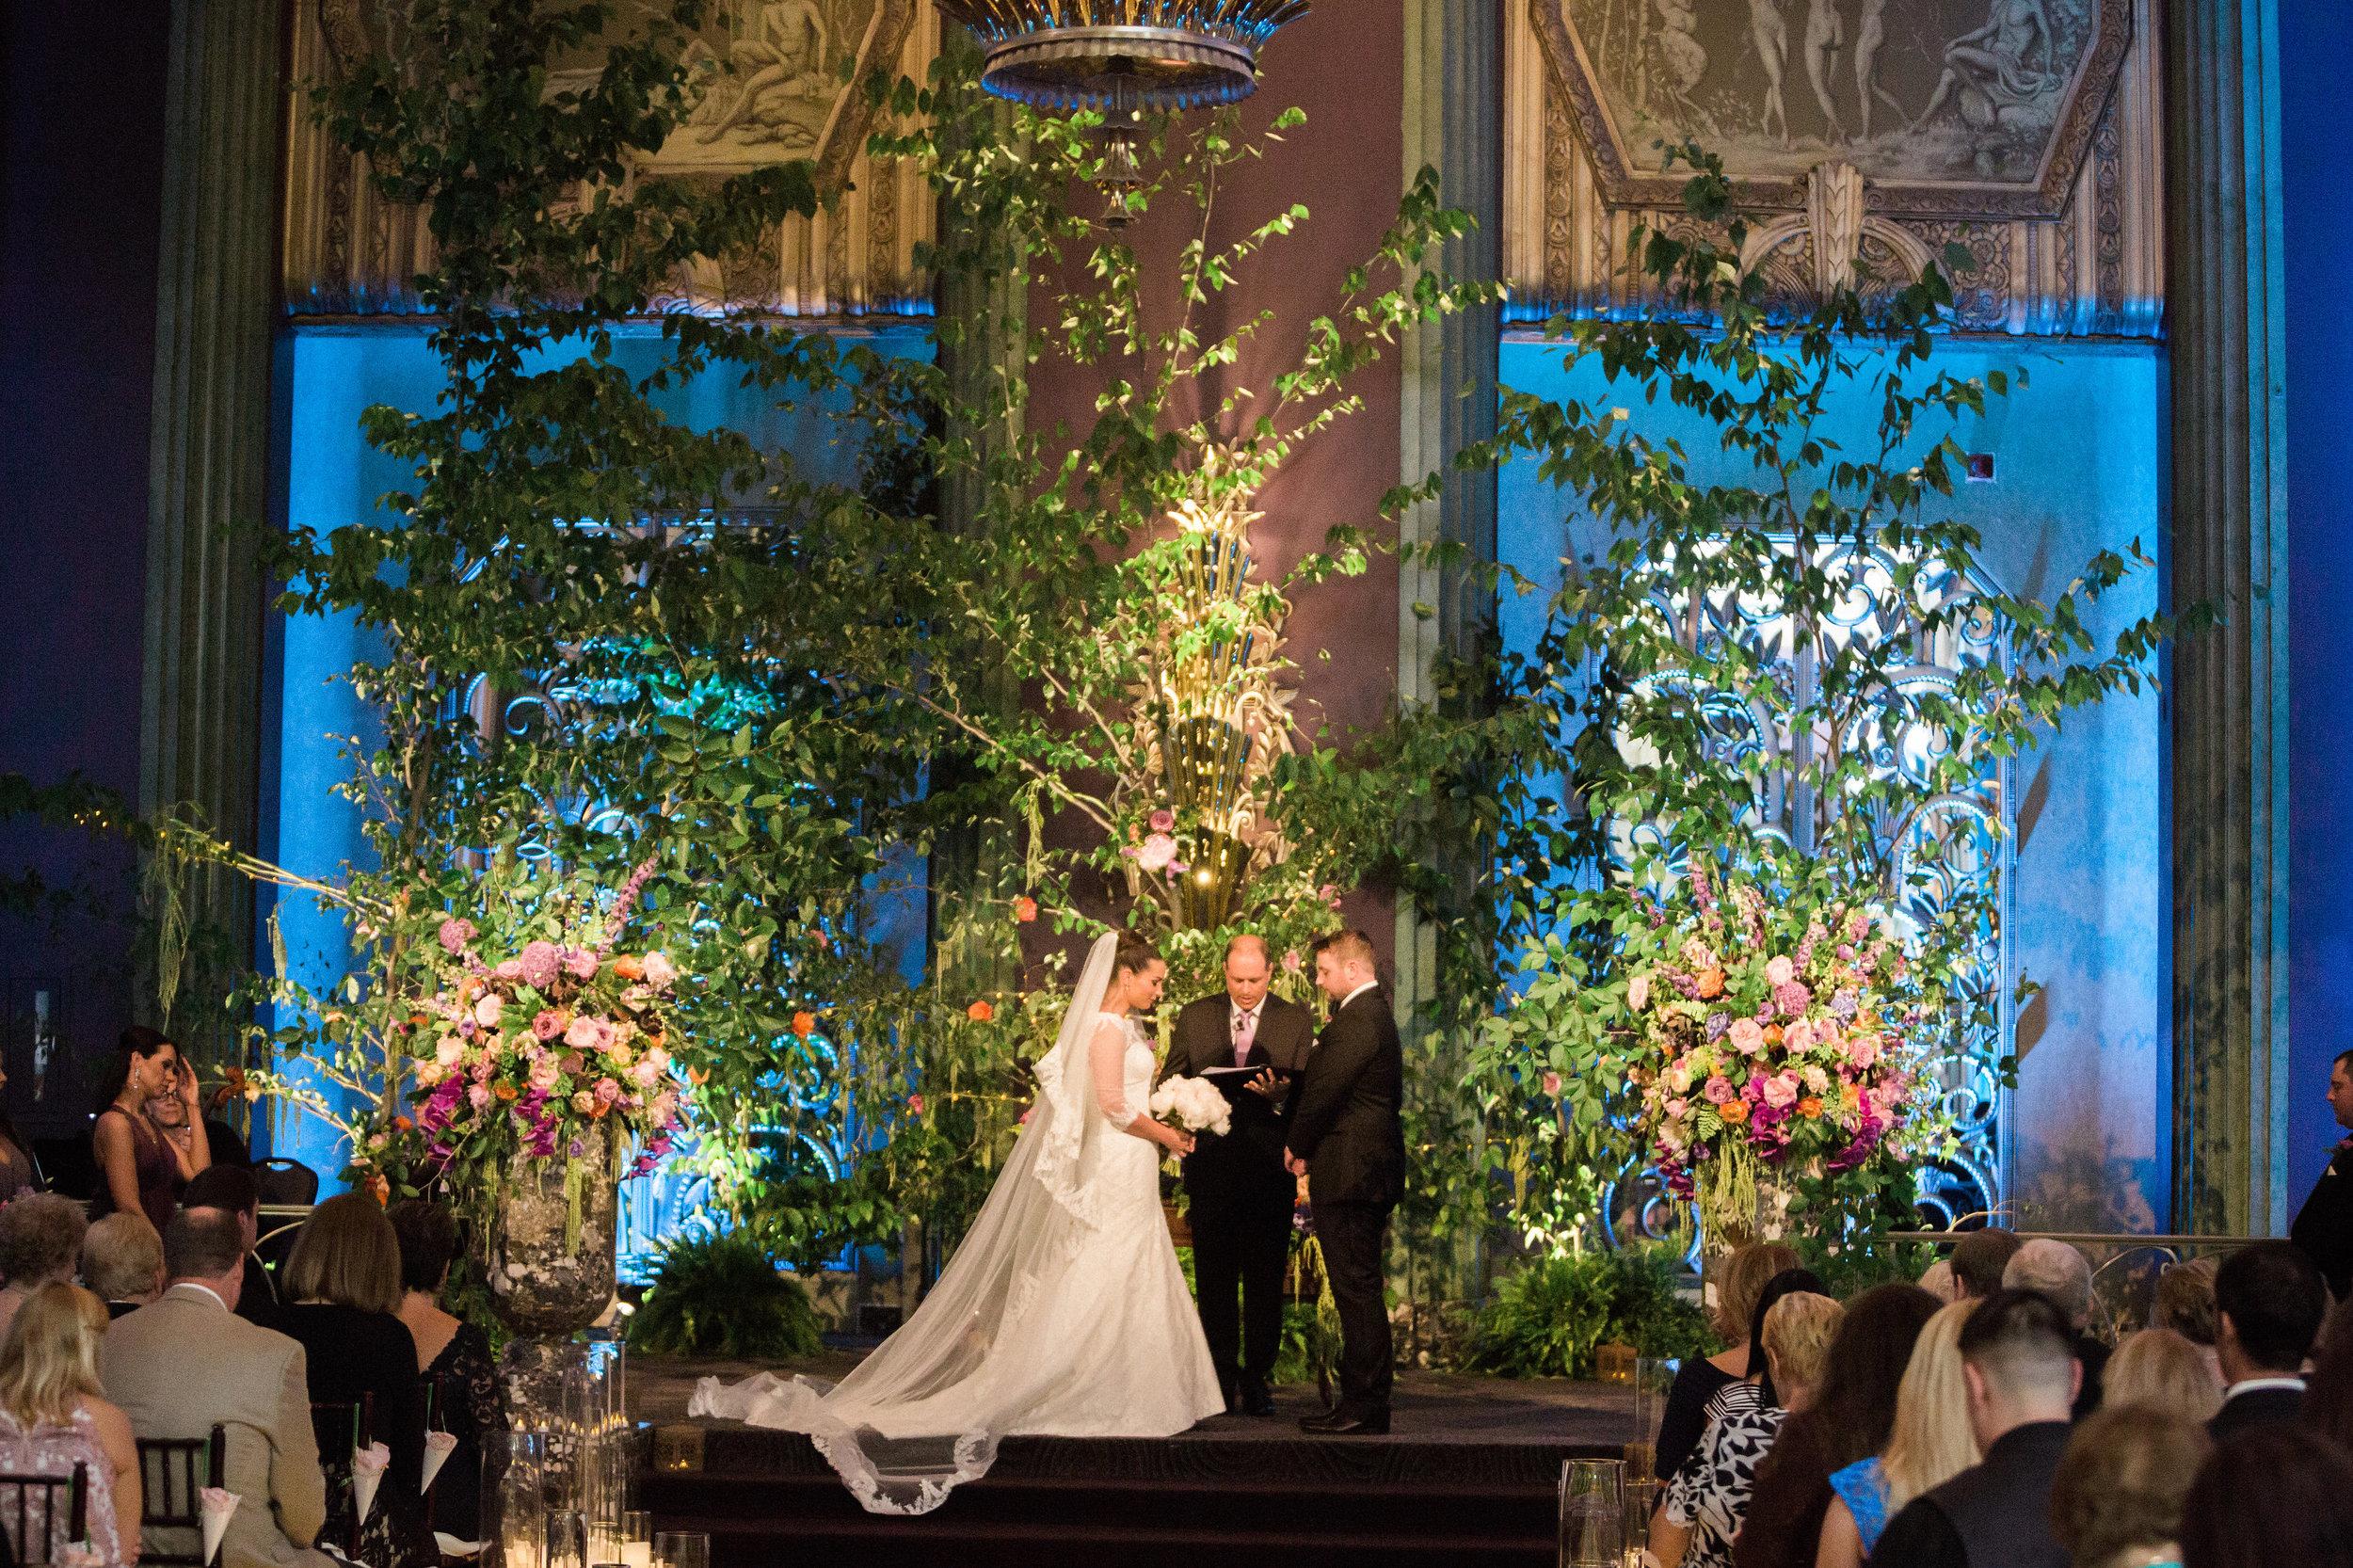 Ceremoney Shot at The Hilton Netherland Plaza Hotel Continental Room Cincinnati, OH